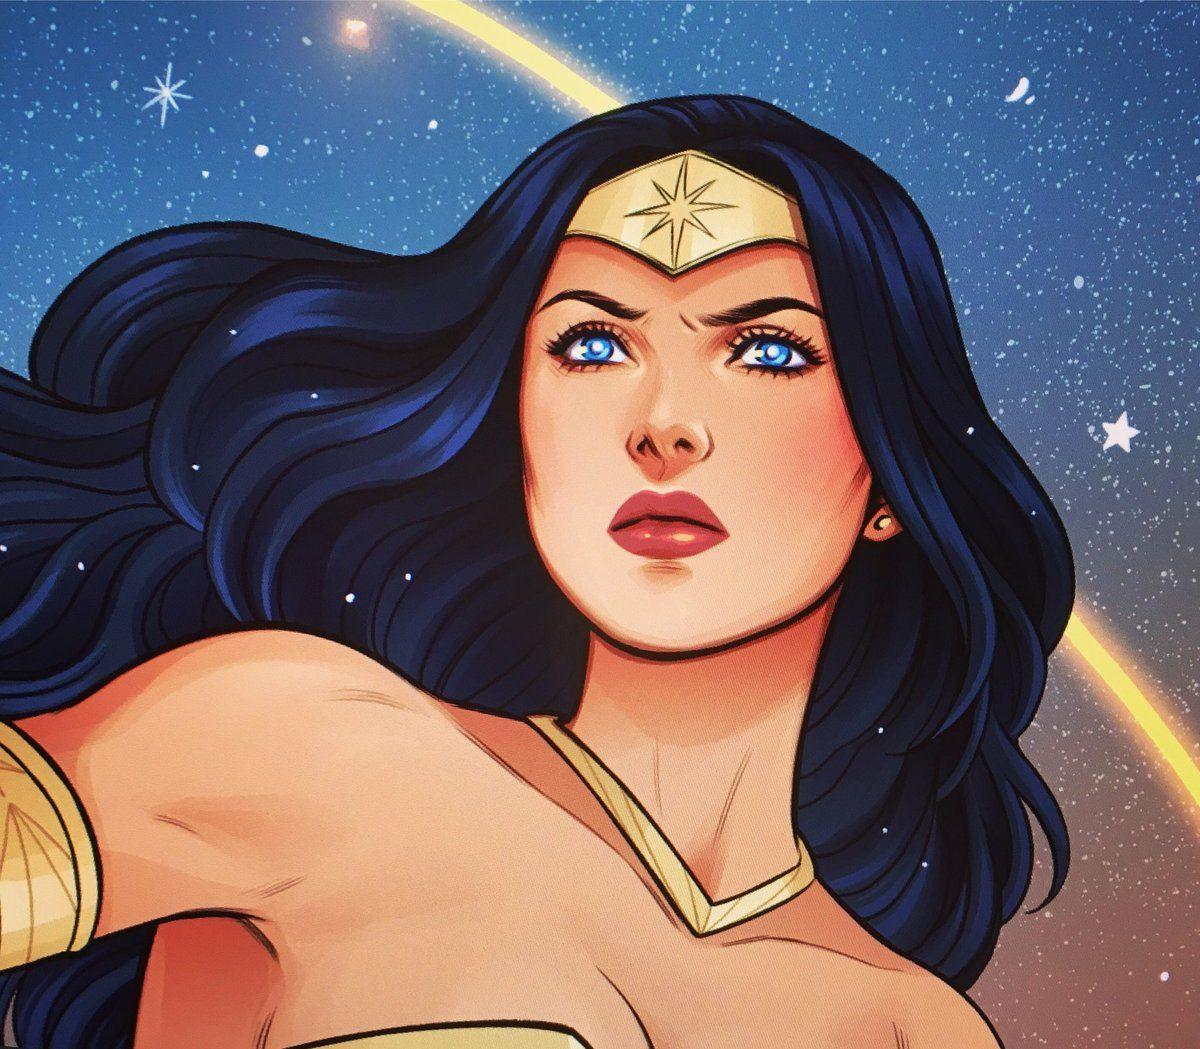 best of dc girls on | Mujer maravilla, La mujer maravilla y Bellisima